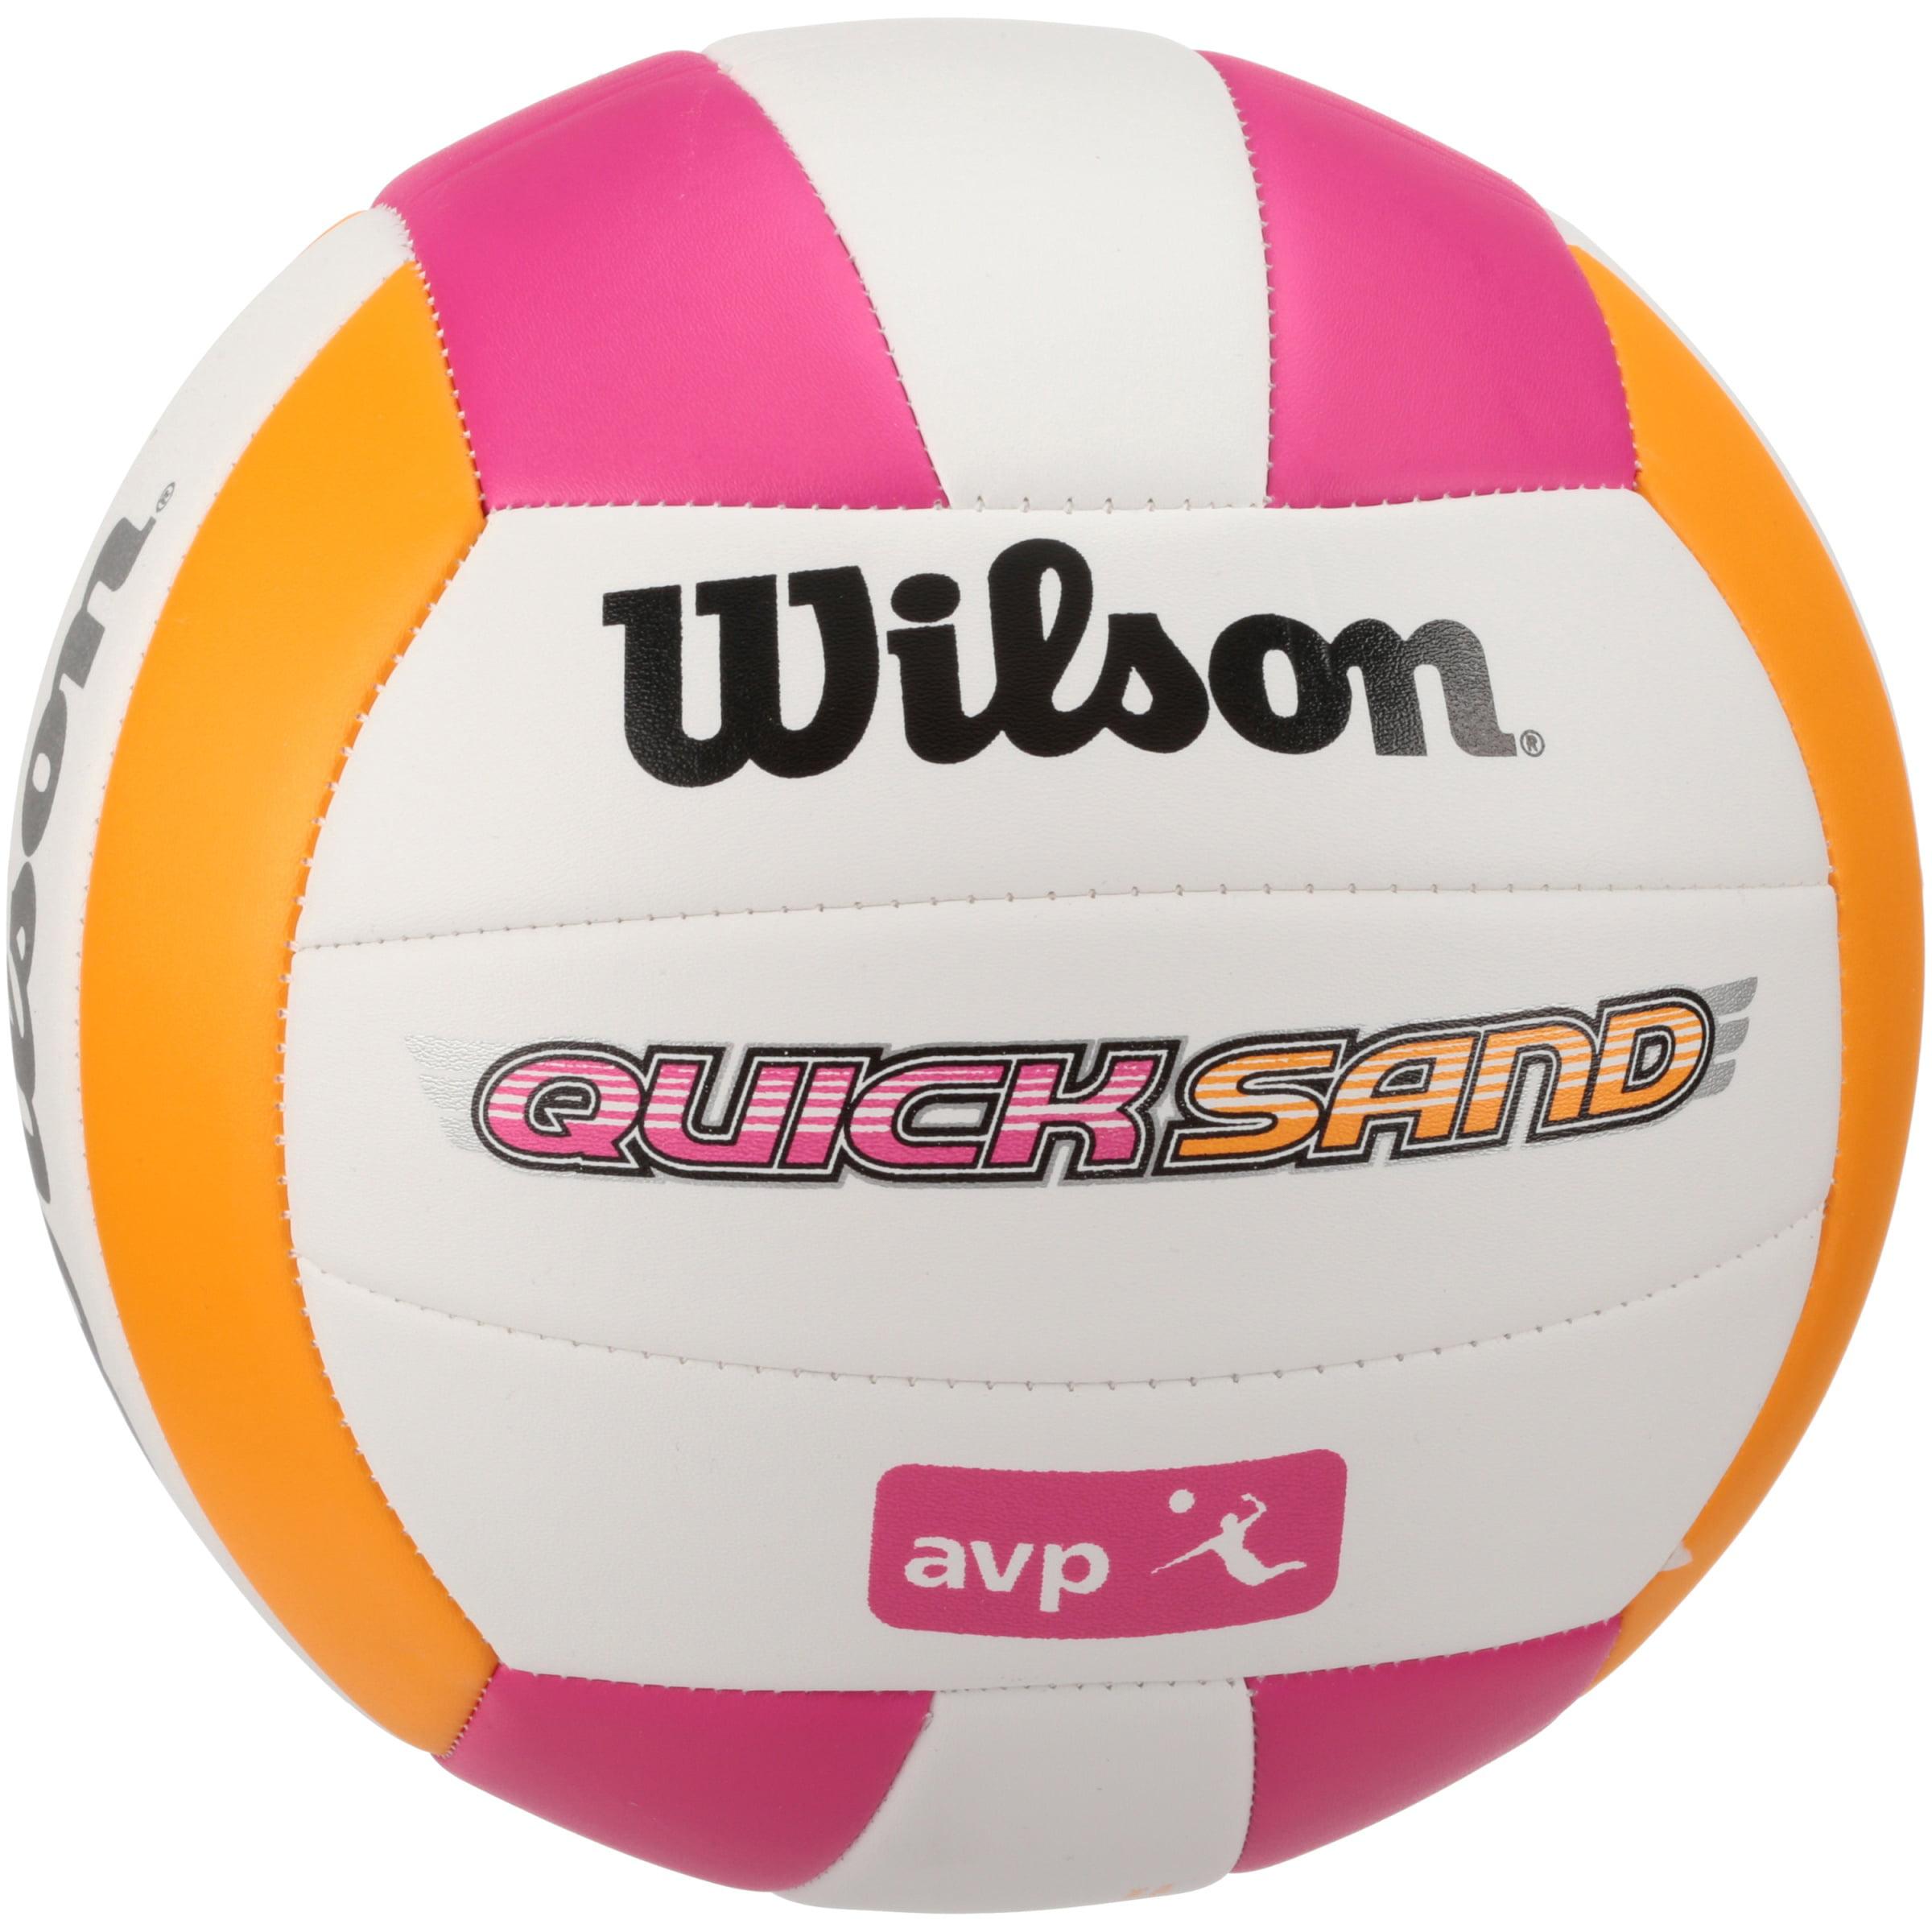 Wilson Sporting Goods To Acquire Louisville Slugger Brand